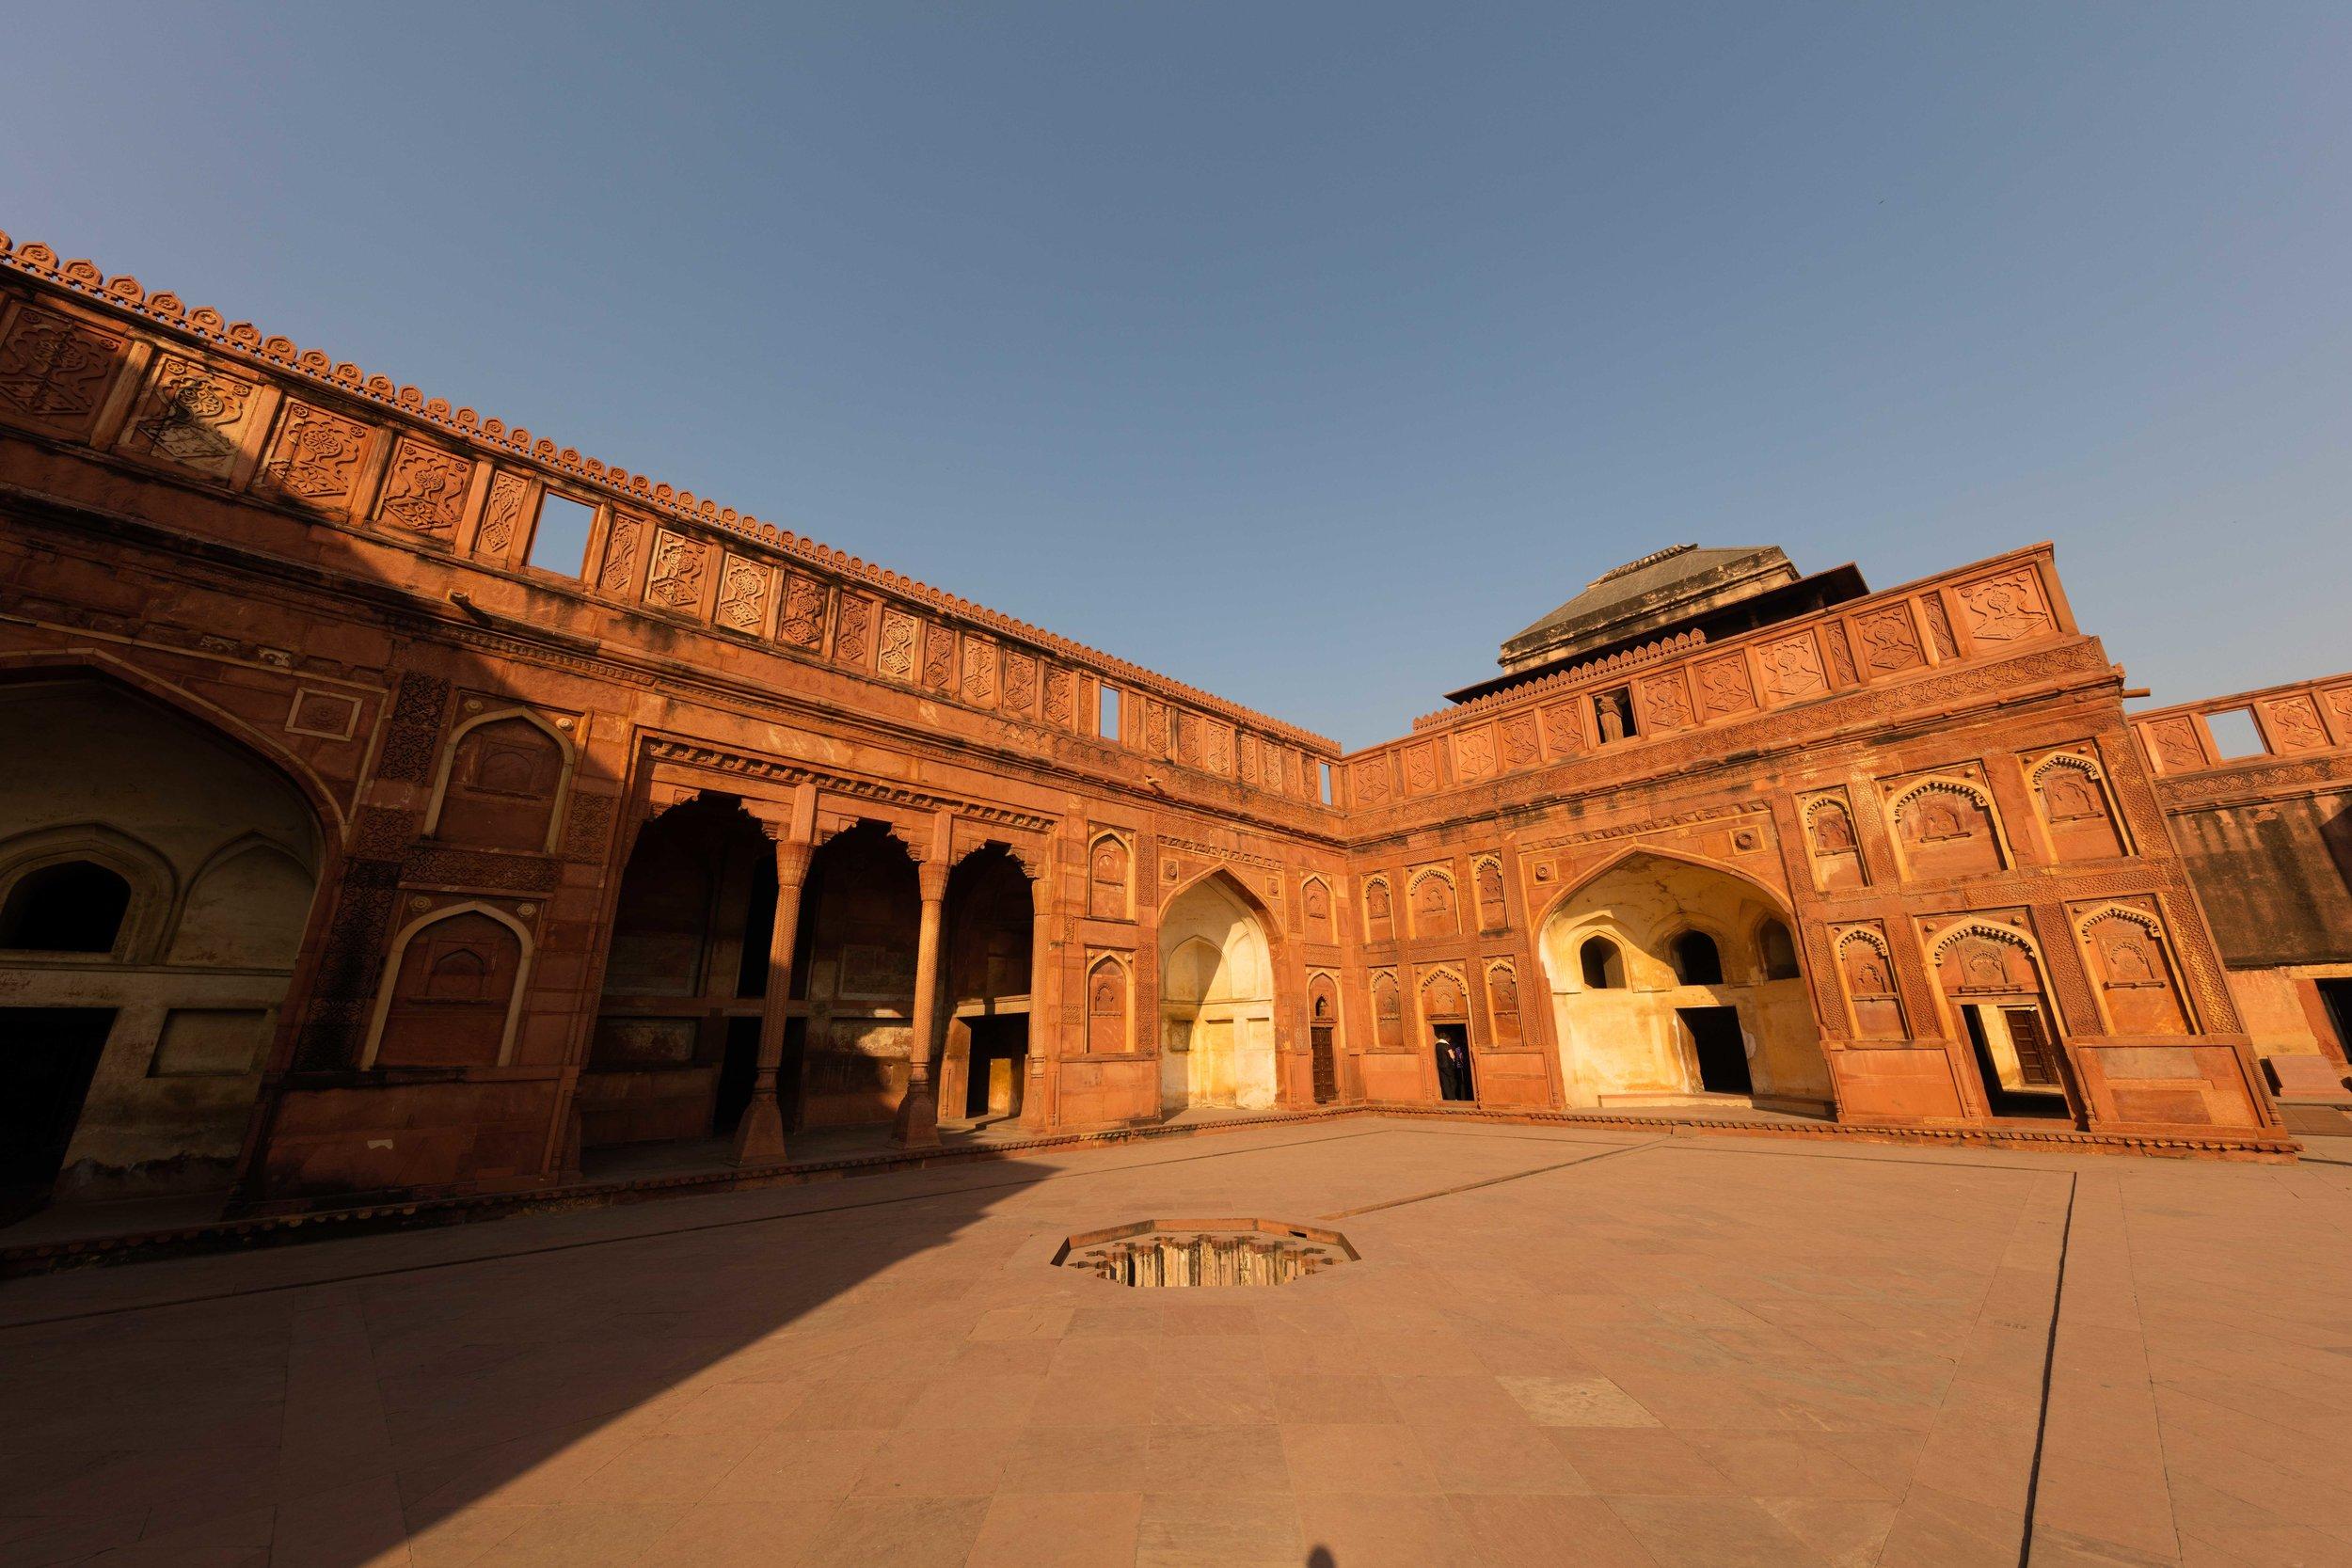 Agra Fort, Barracks